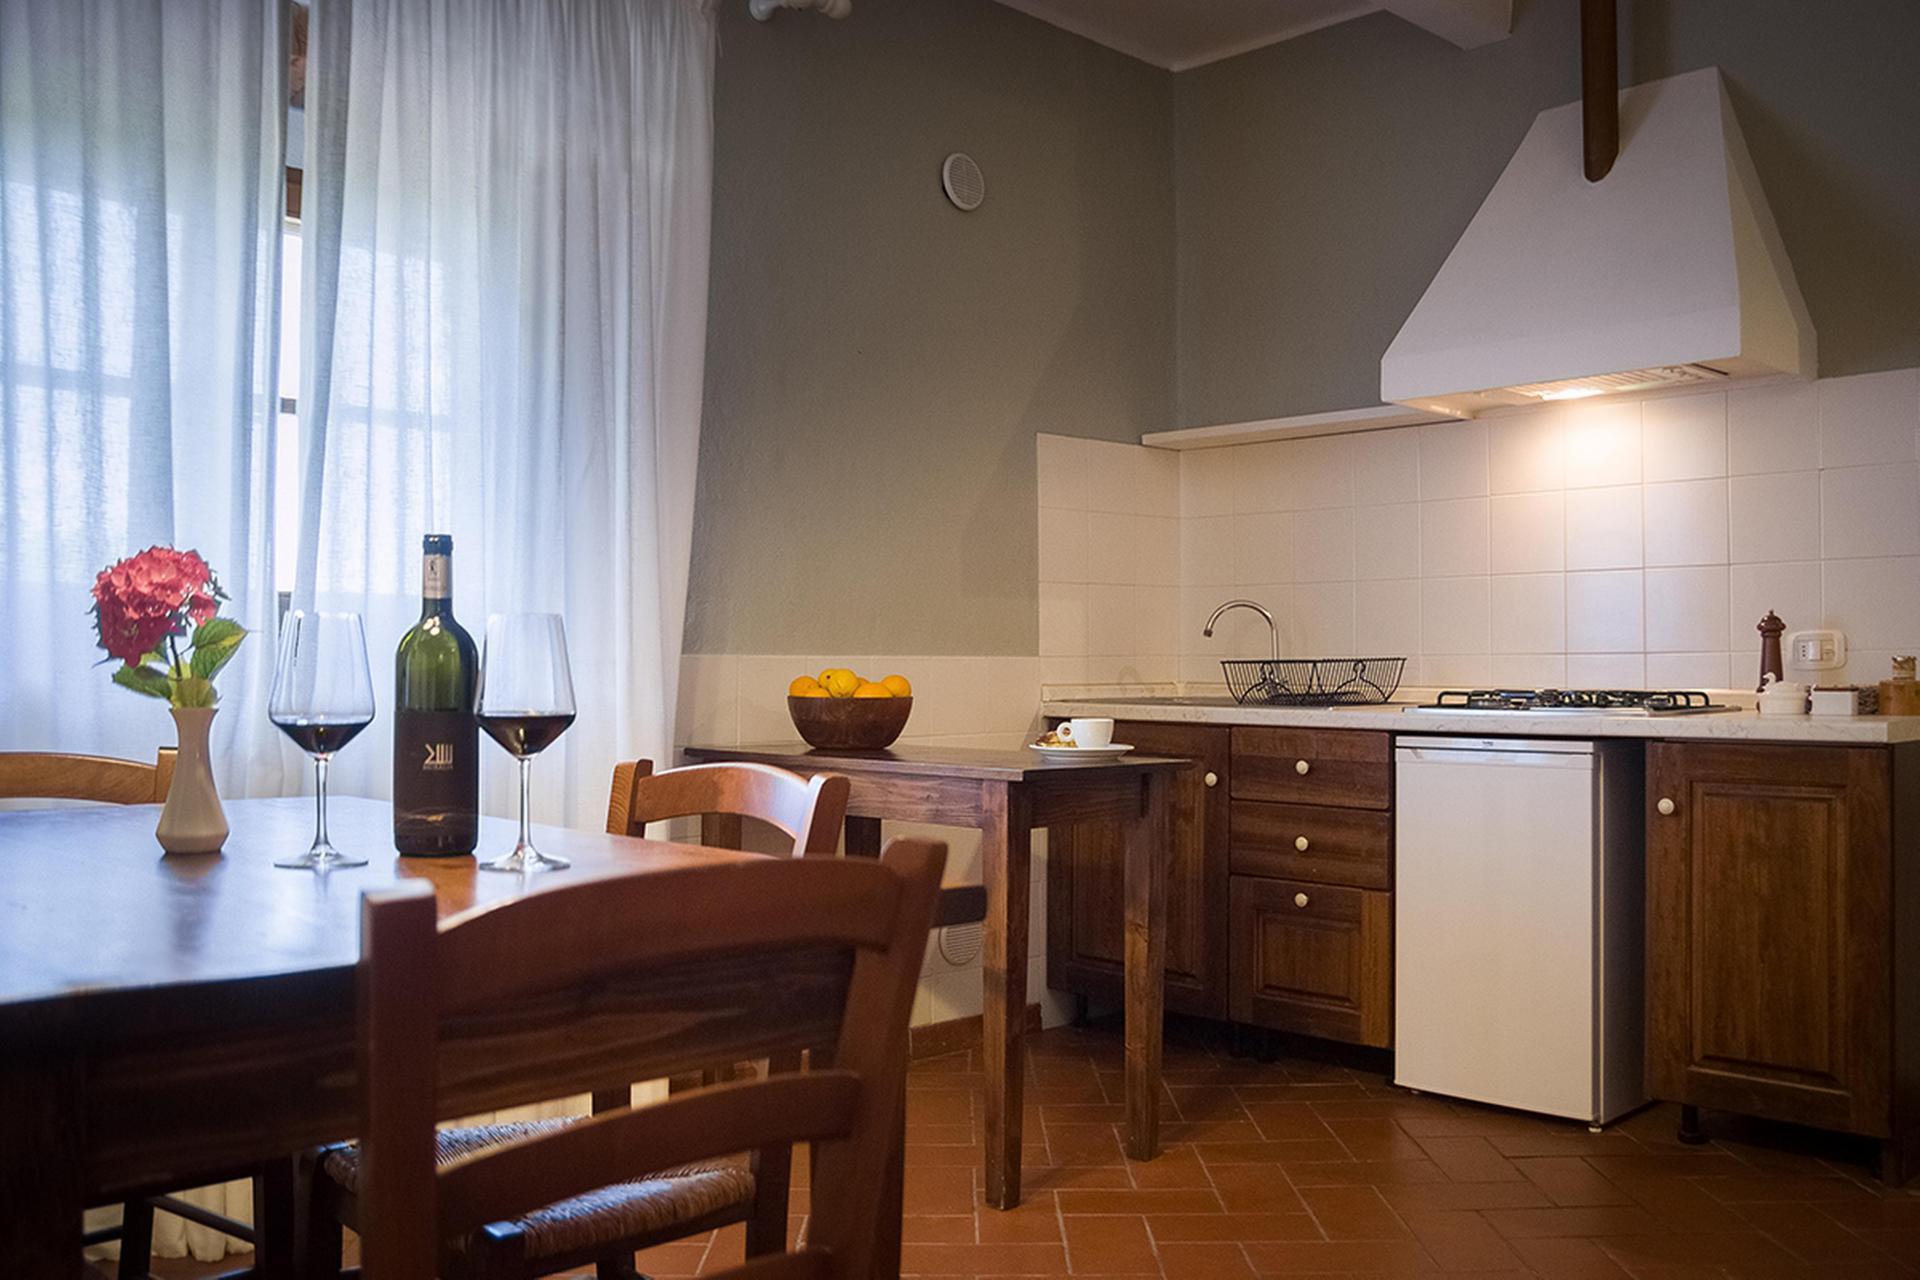 Agriturismo Toskana 10 gemütliche Wohnungen in der Maremma - Toskana | myitalyselection.de